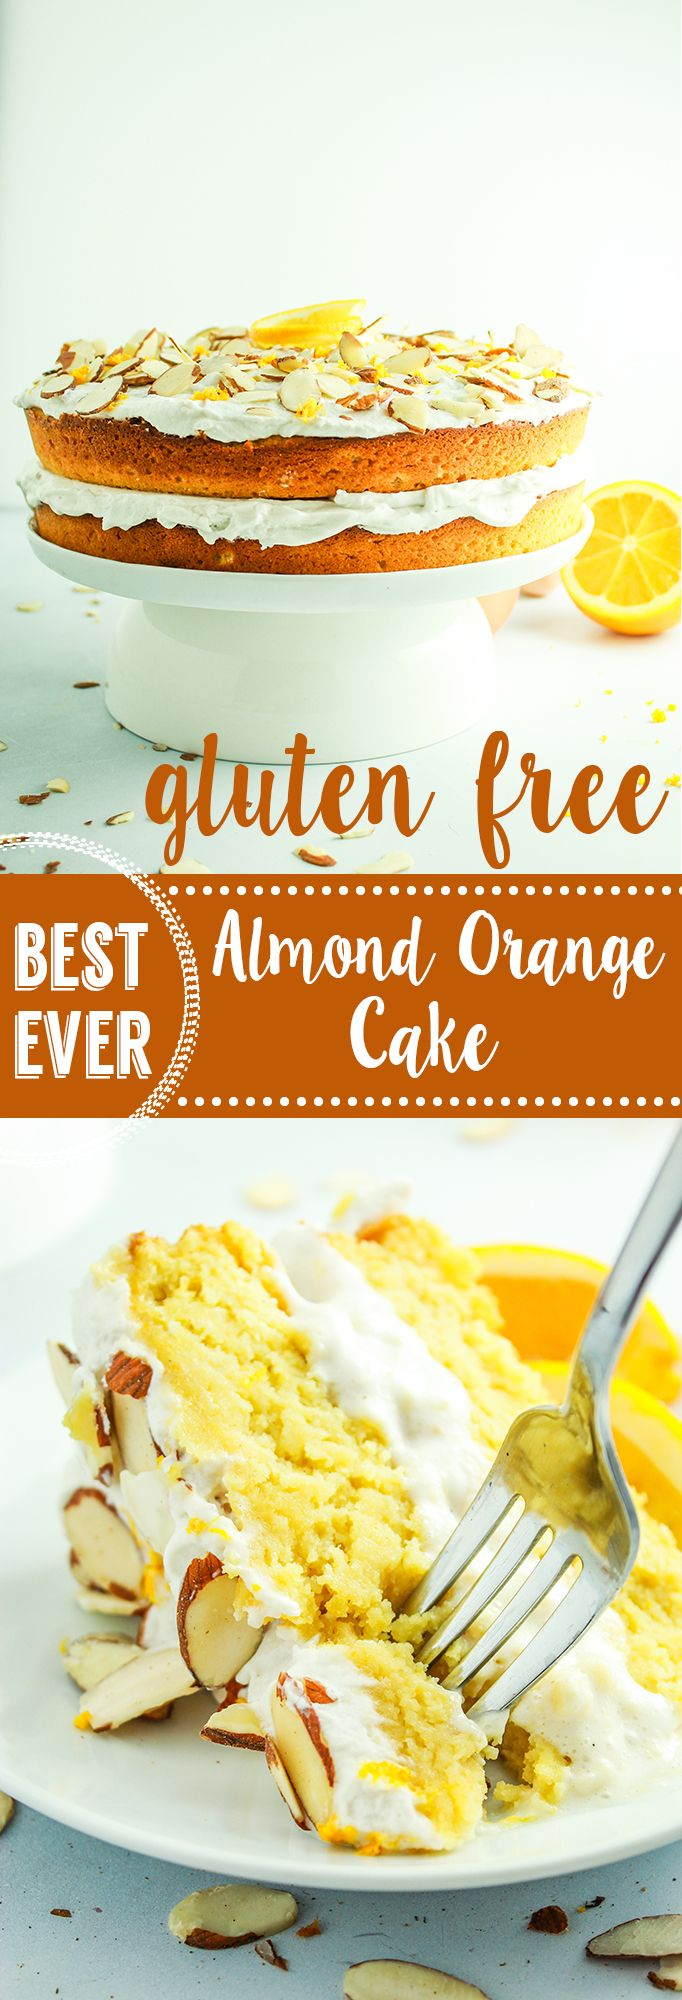 Gluten Free Almond Cake on Pinterest | Lactose free sweets, Gluten ...